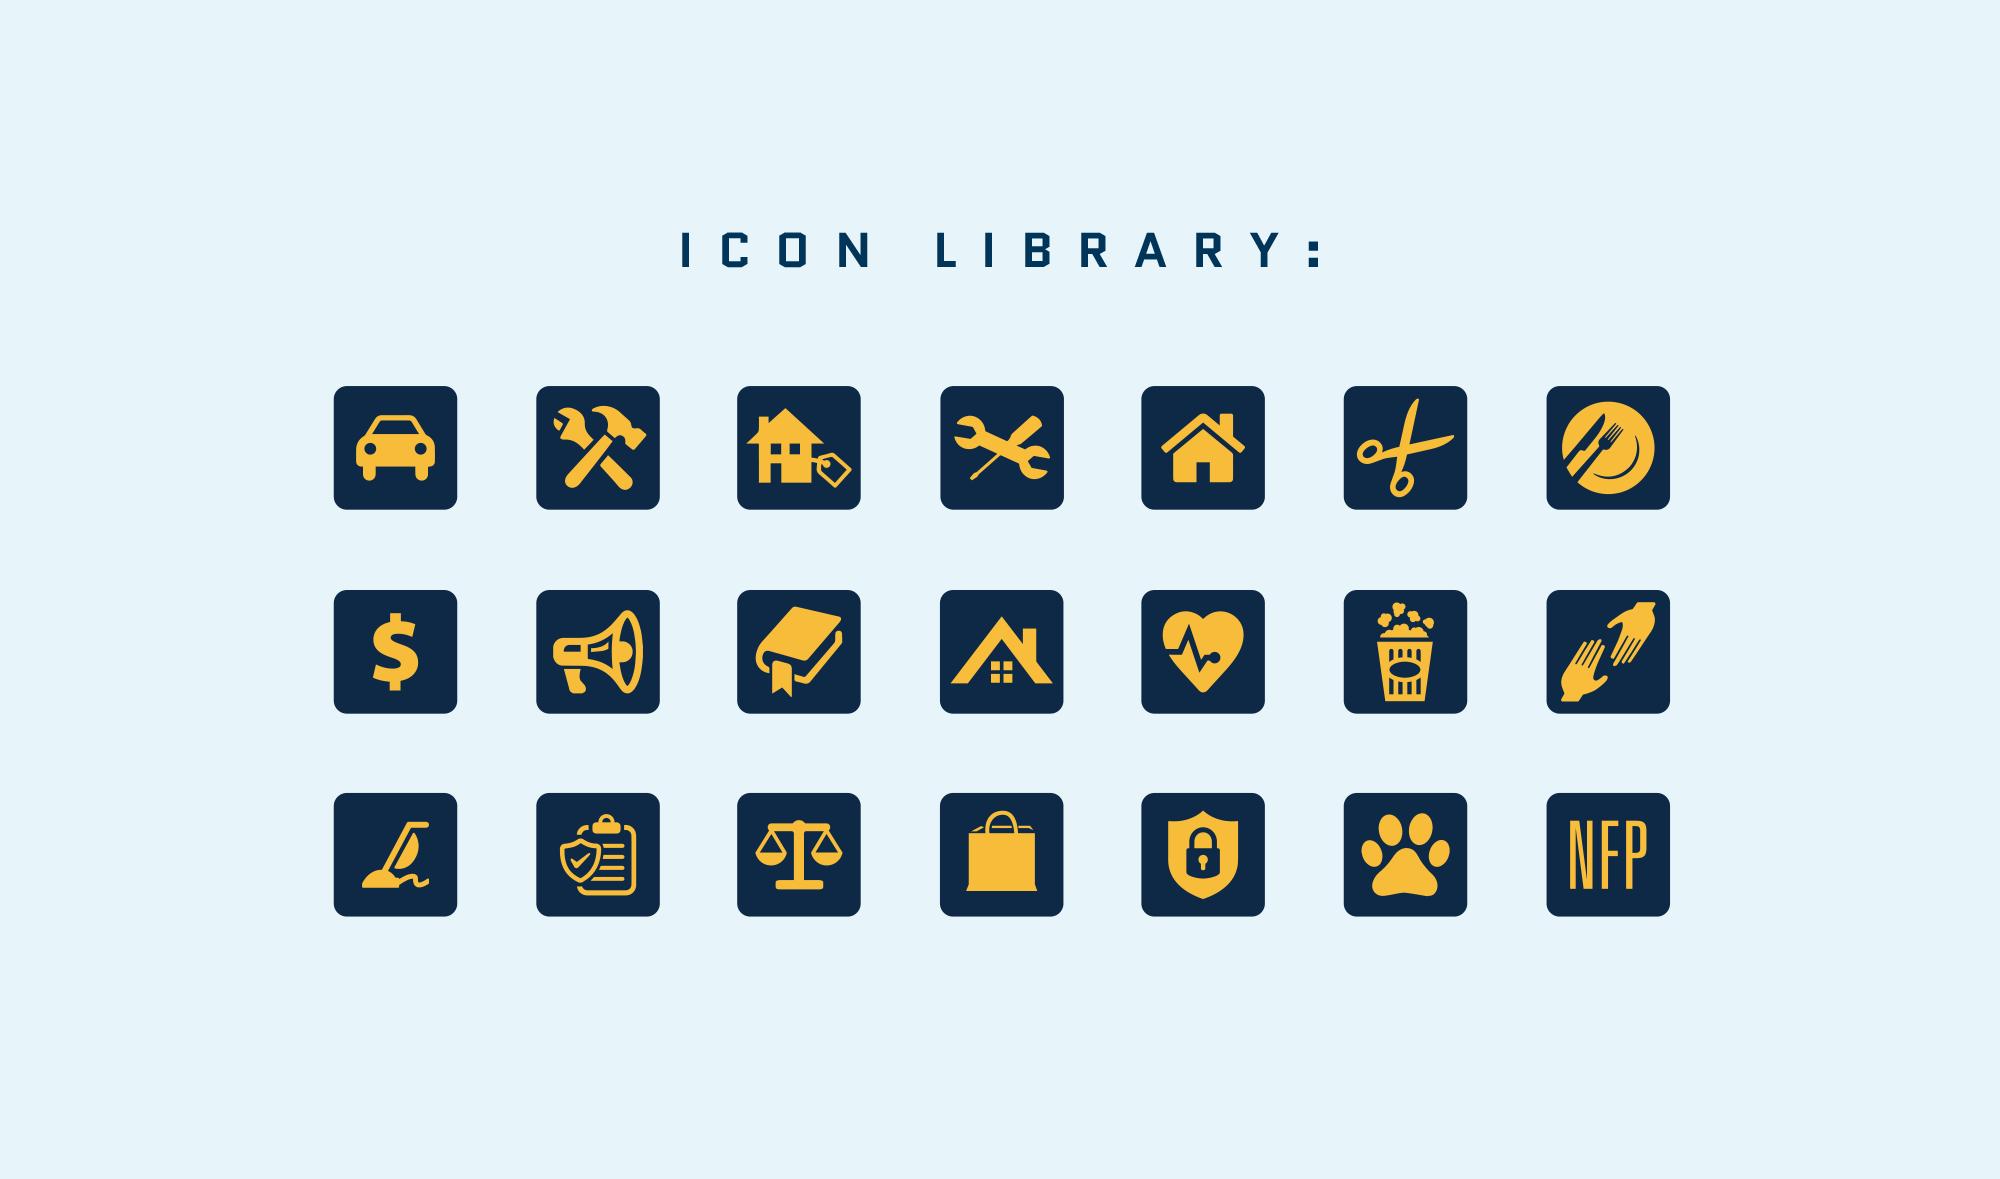 HERO Icon Library Designs